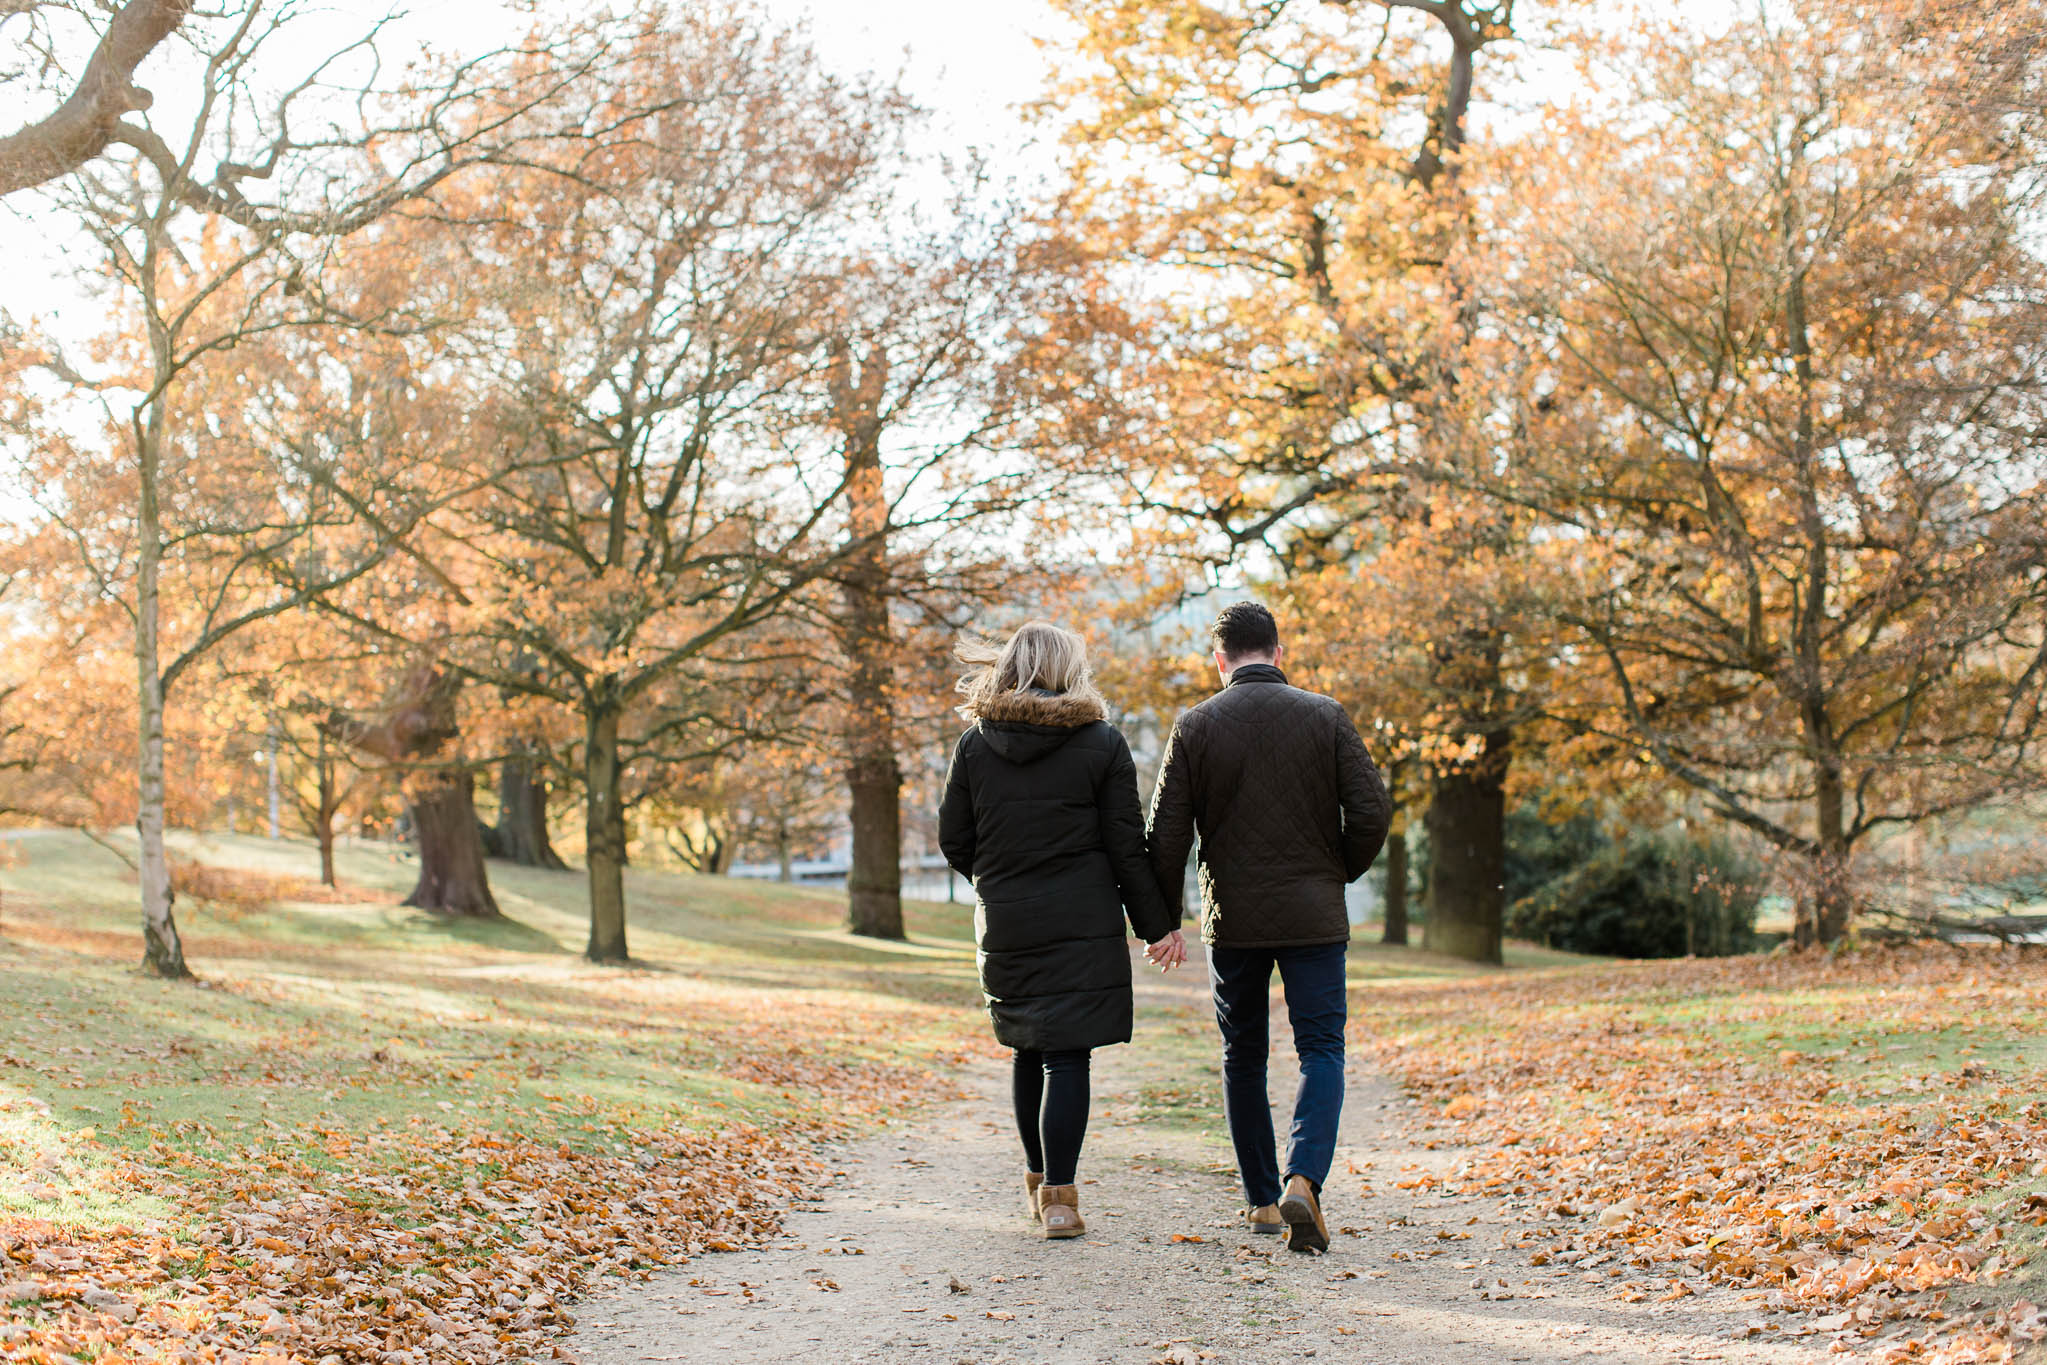 pre-wedding photo shoot in autumn woodland